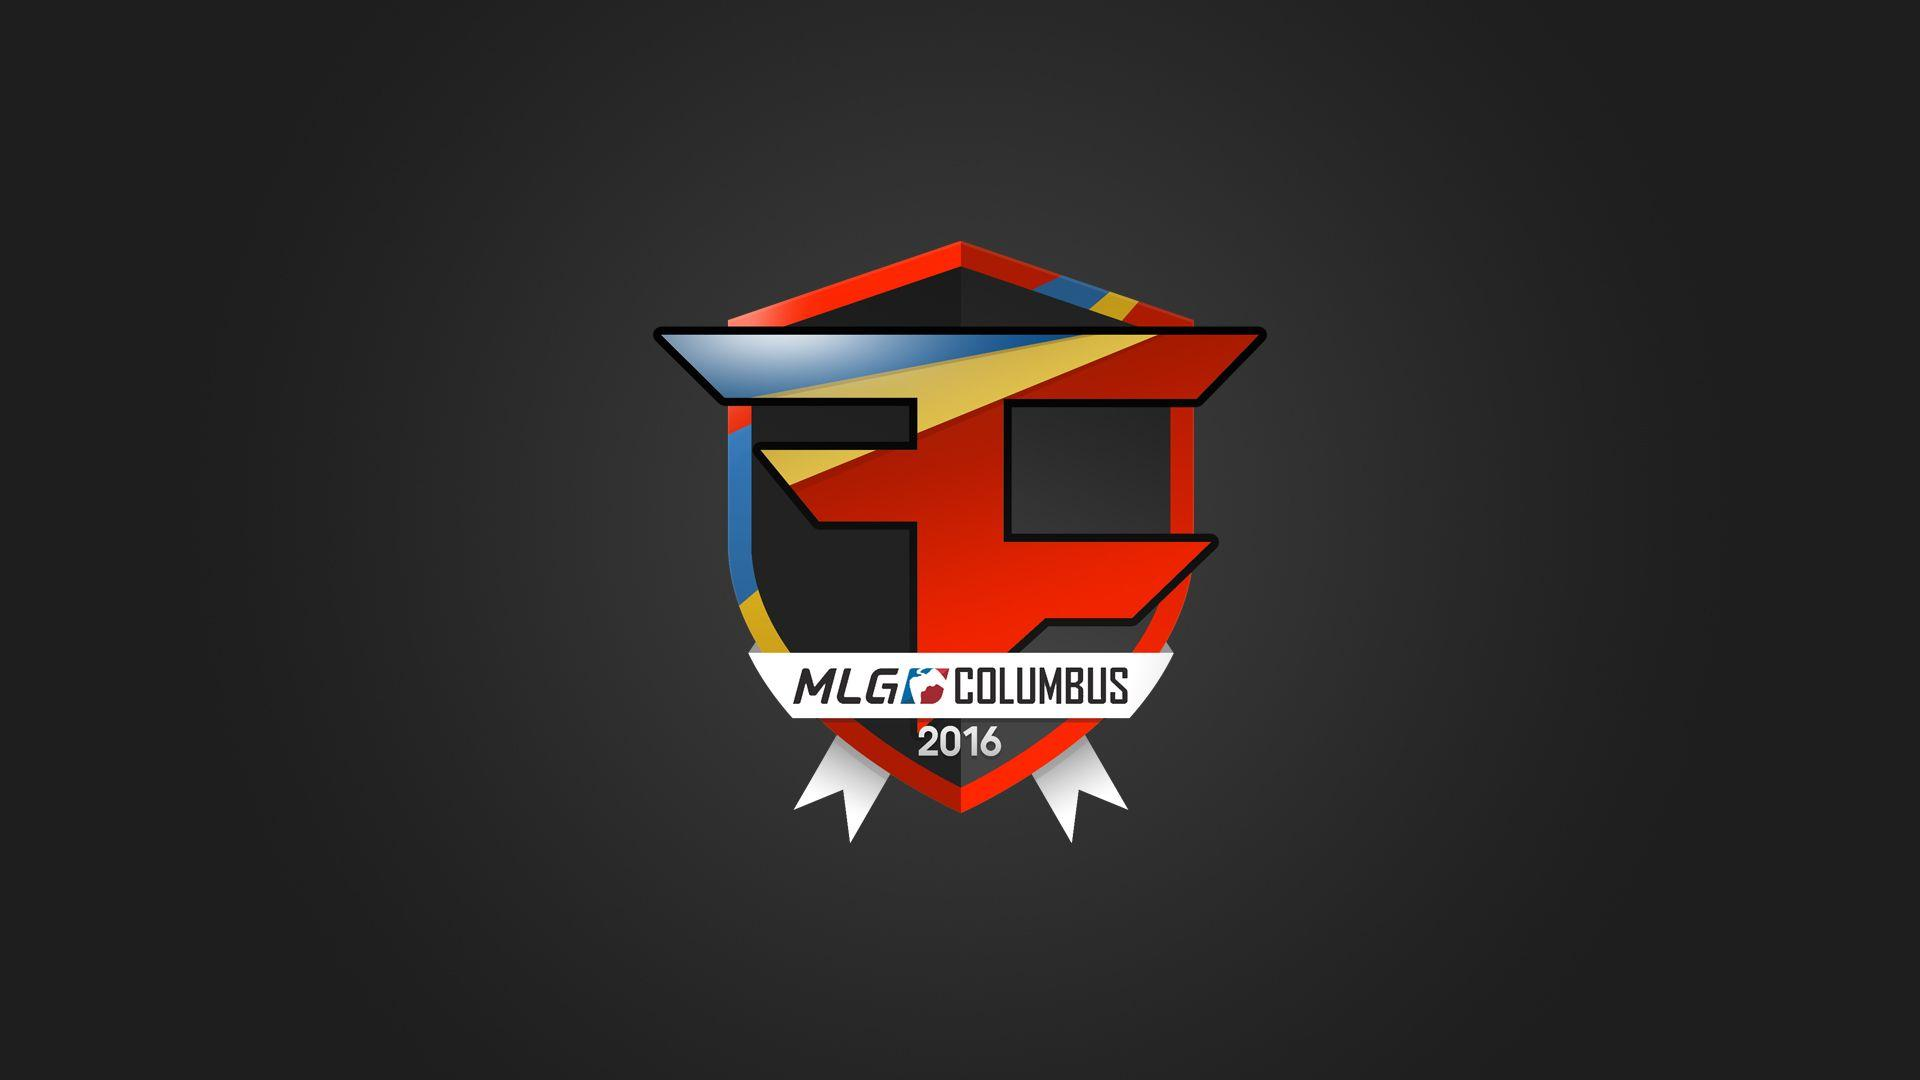 faze clan wallpapers wallpaper cave mlb team logos 2016 mlb team logos images